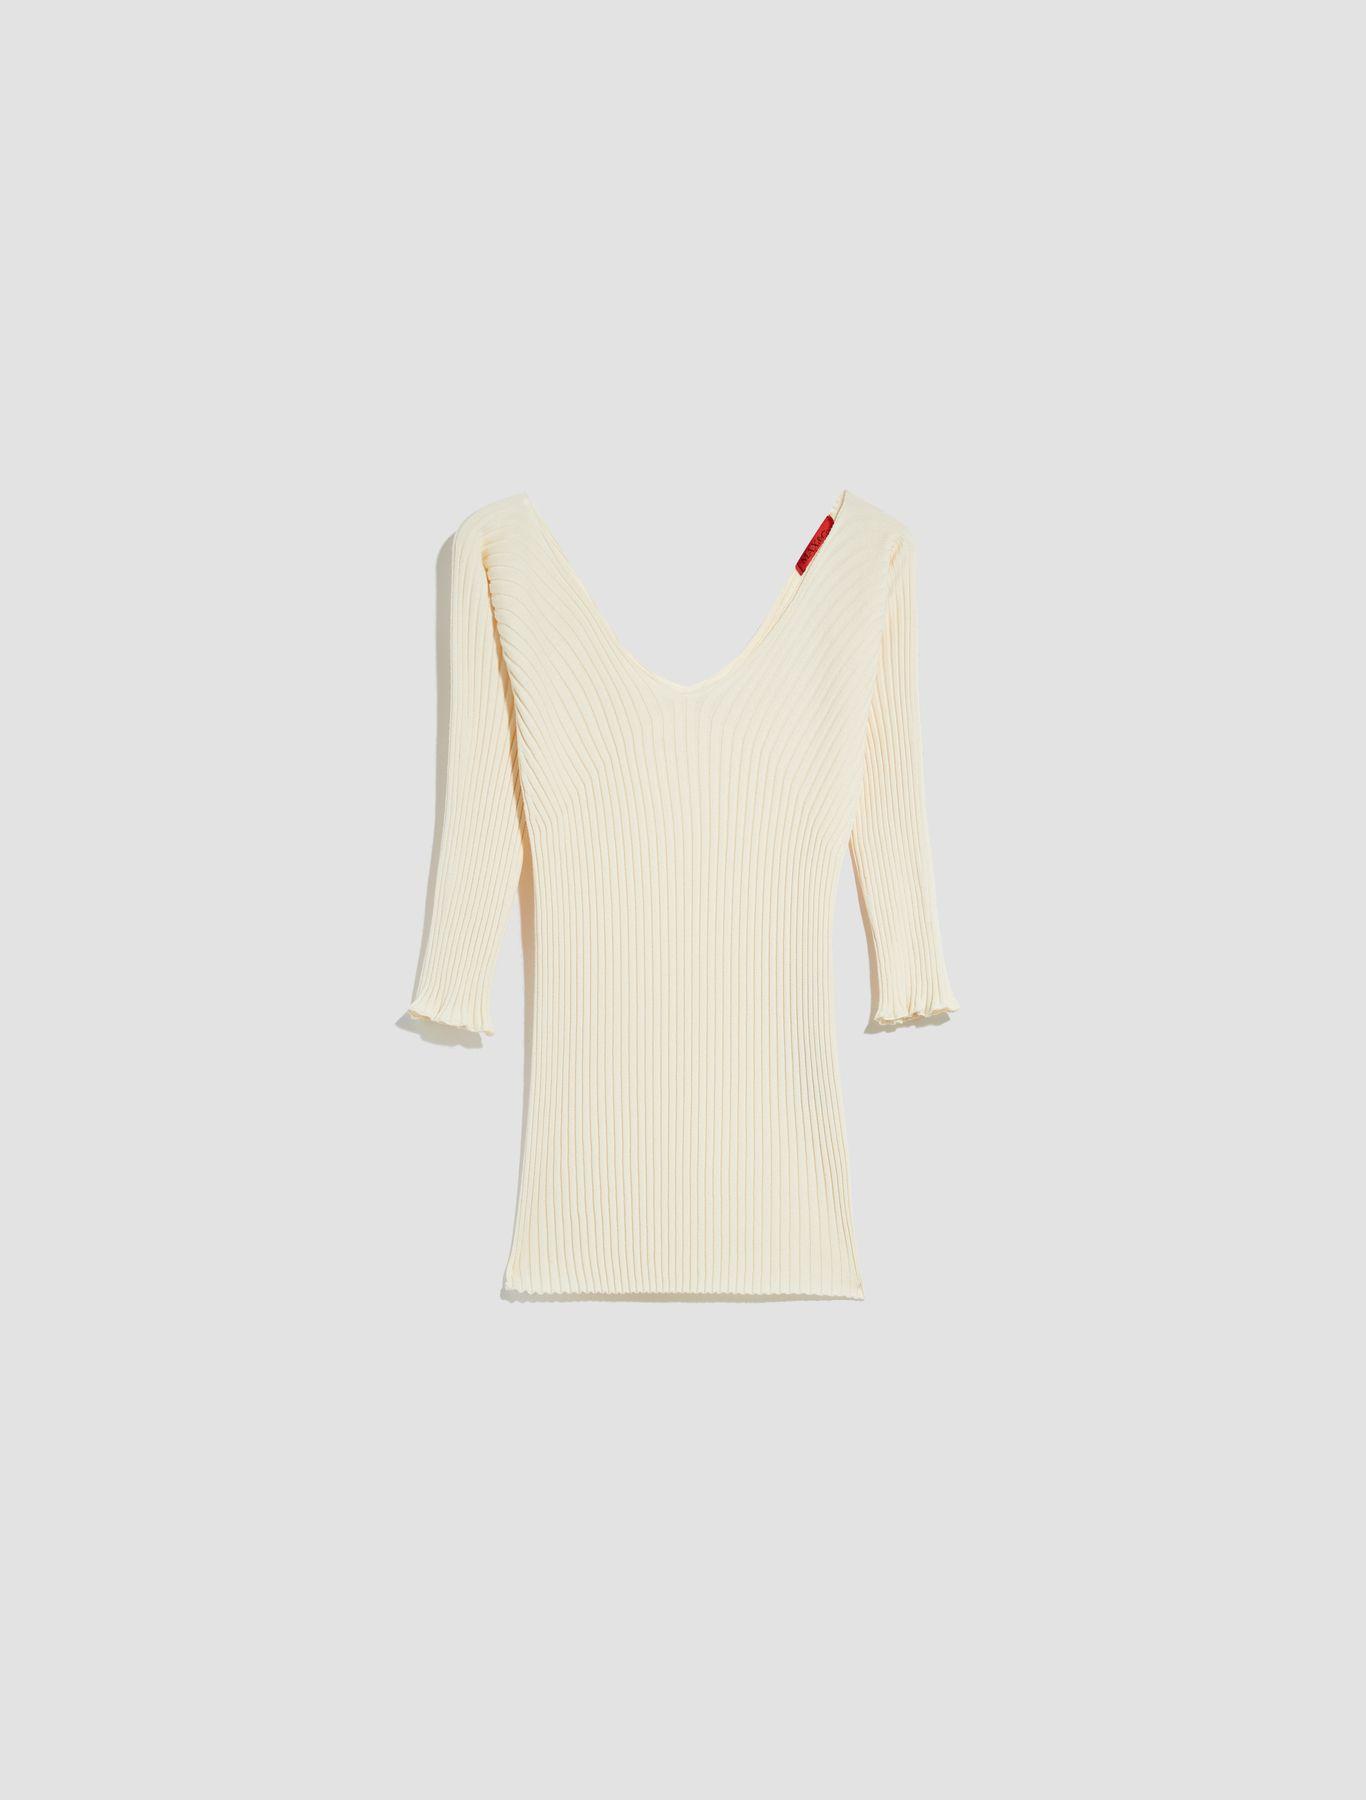 CERVINO Sweater-Tank-Top ivory 5